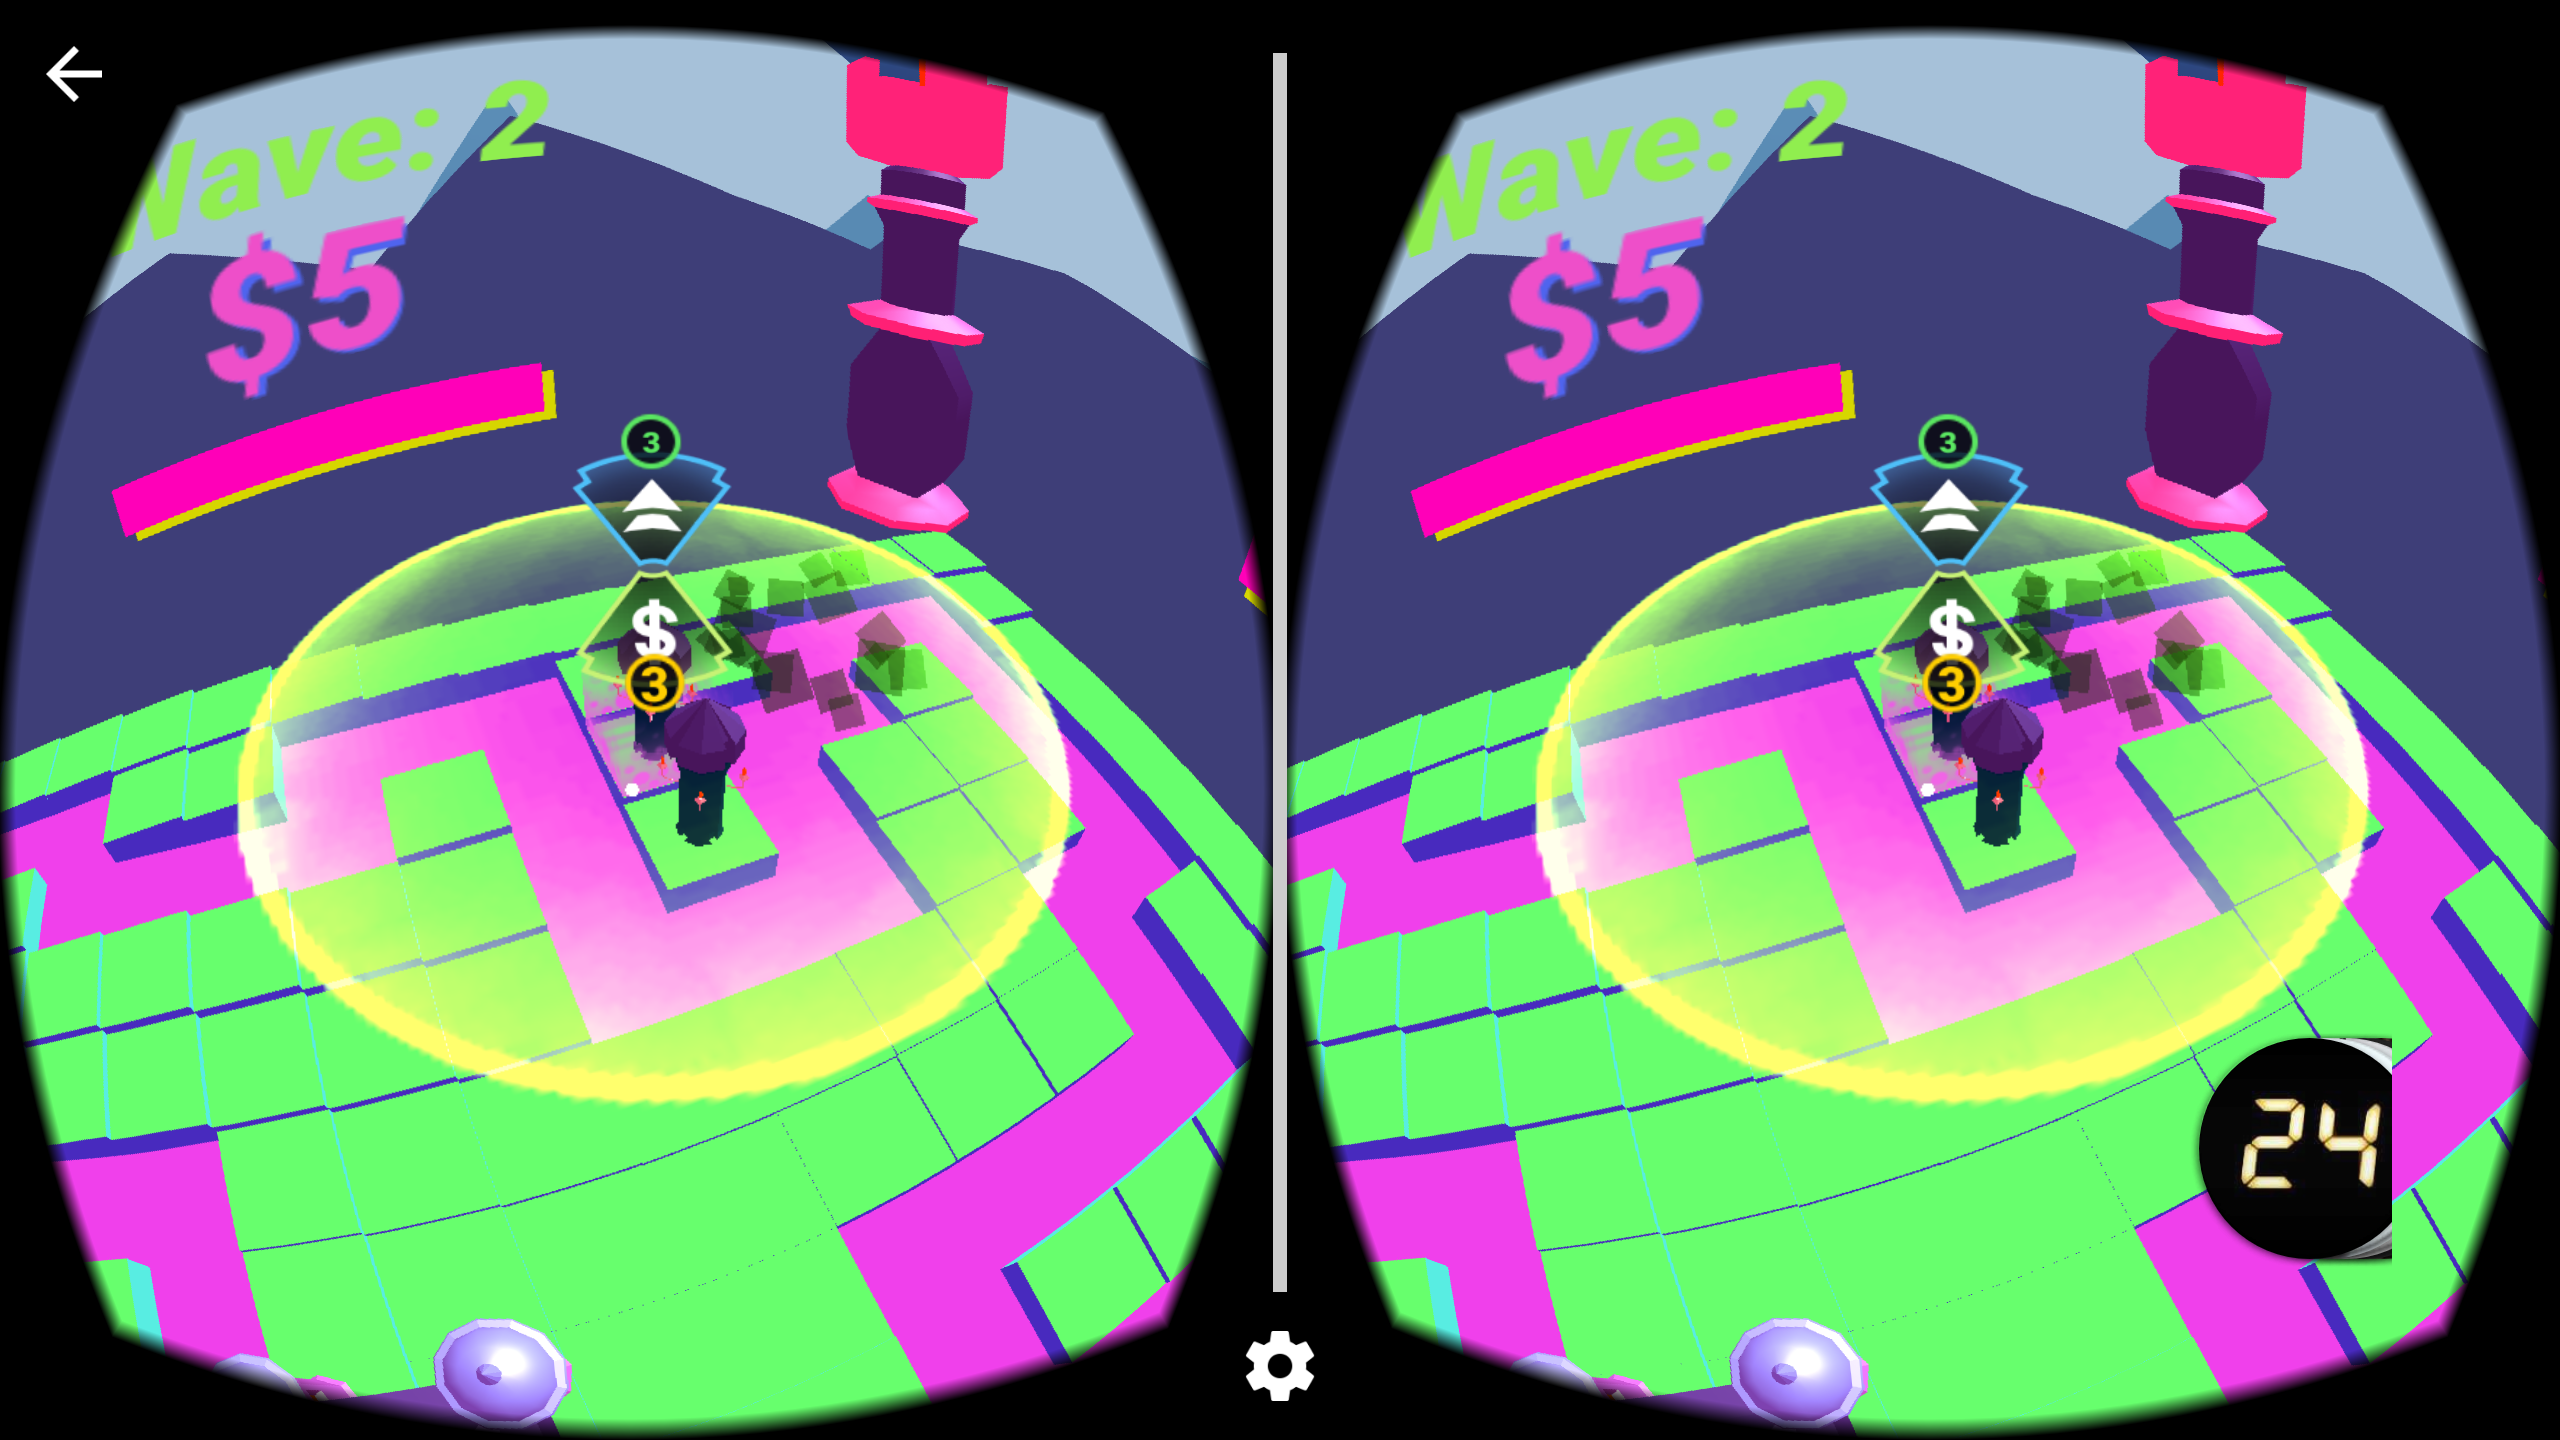 tower defense game using cardboard vr